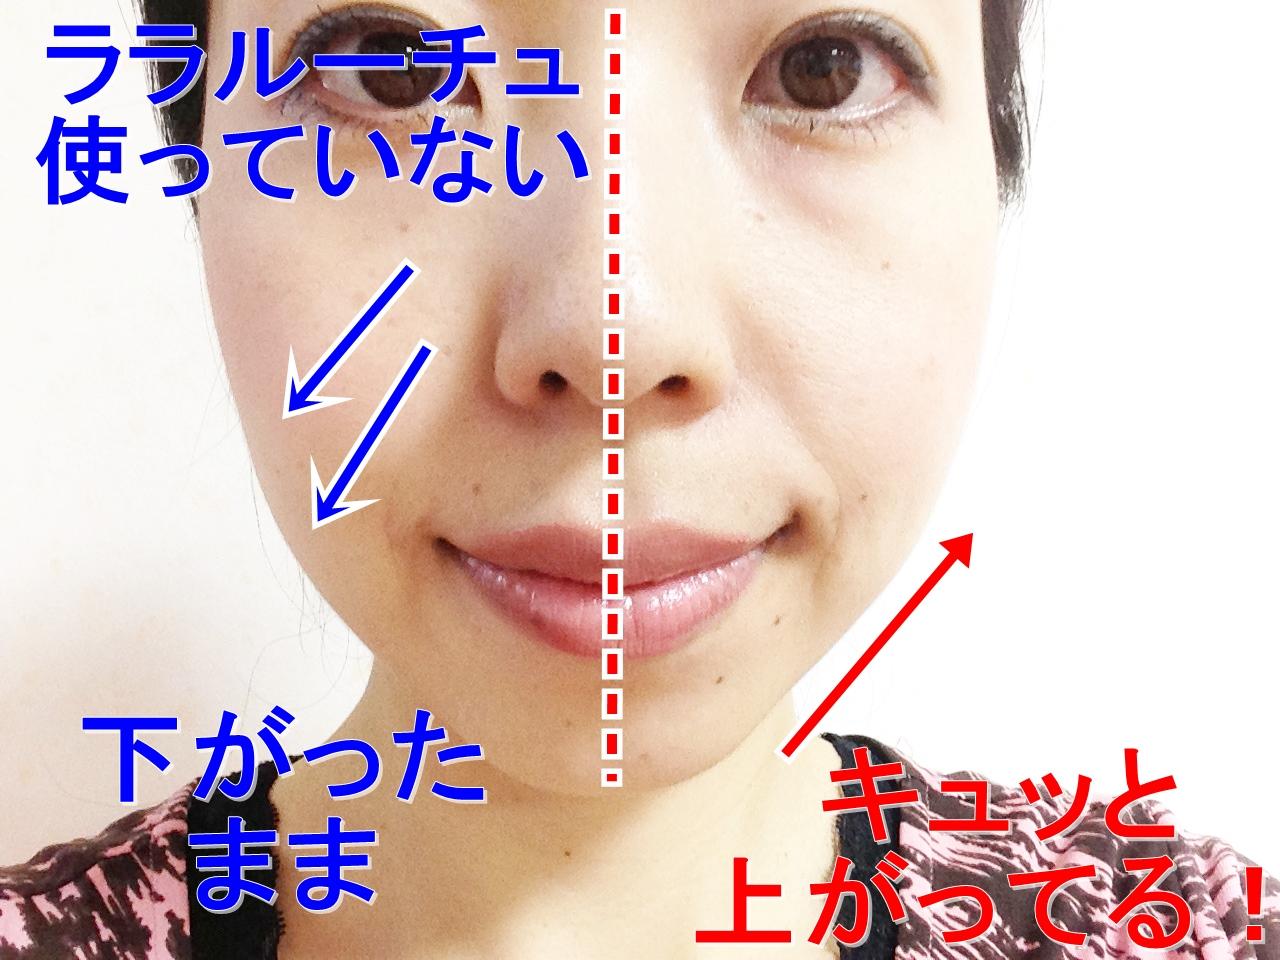 20131206121605f7e.jpg